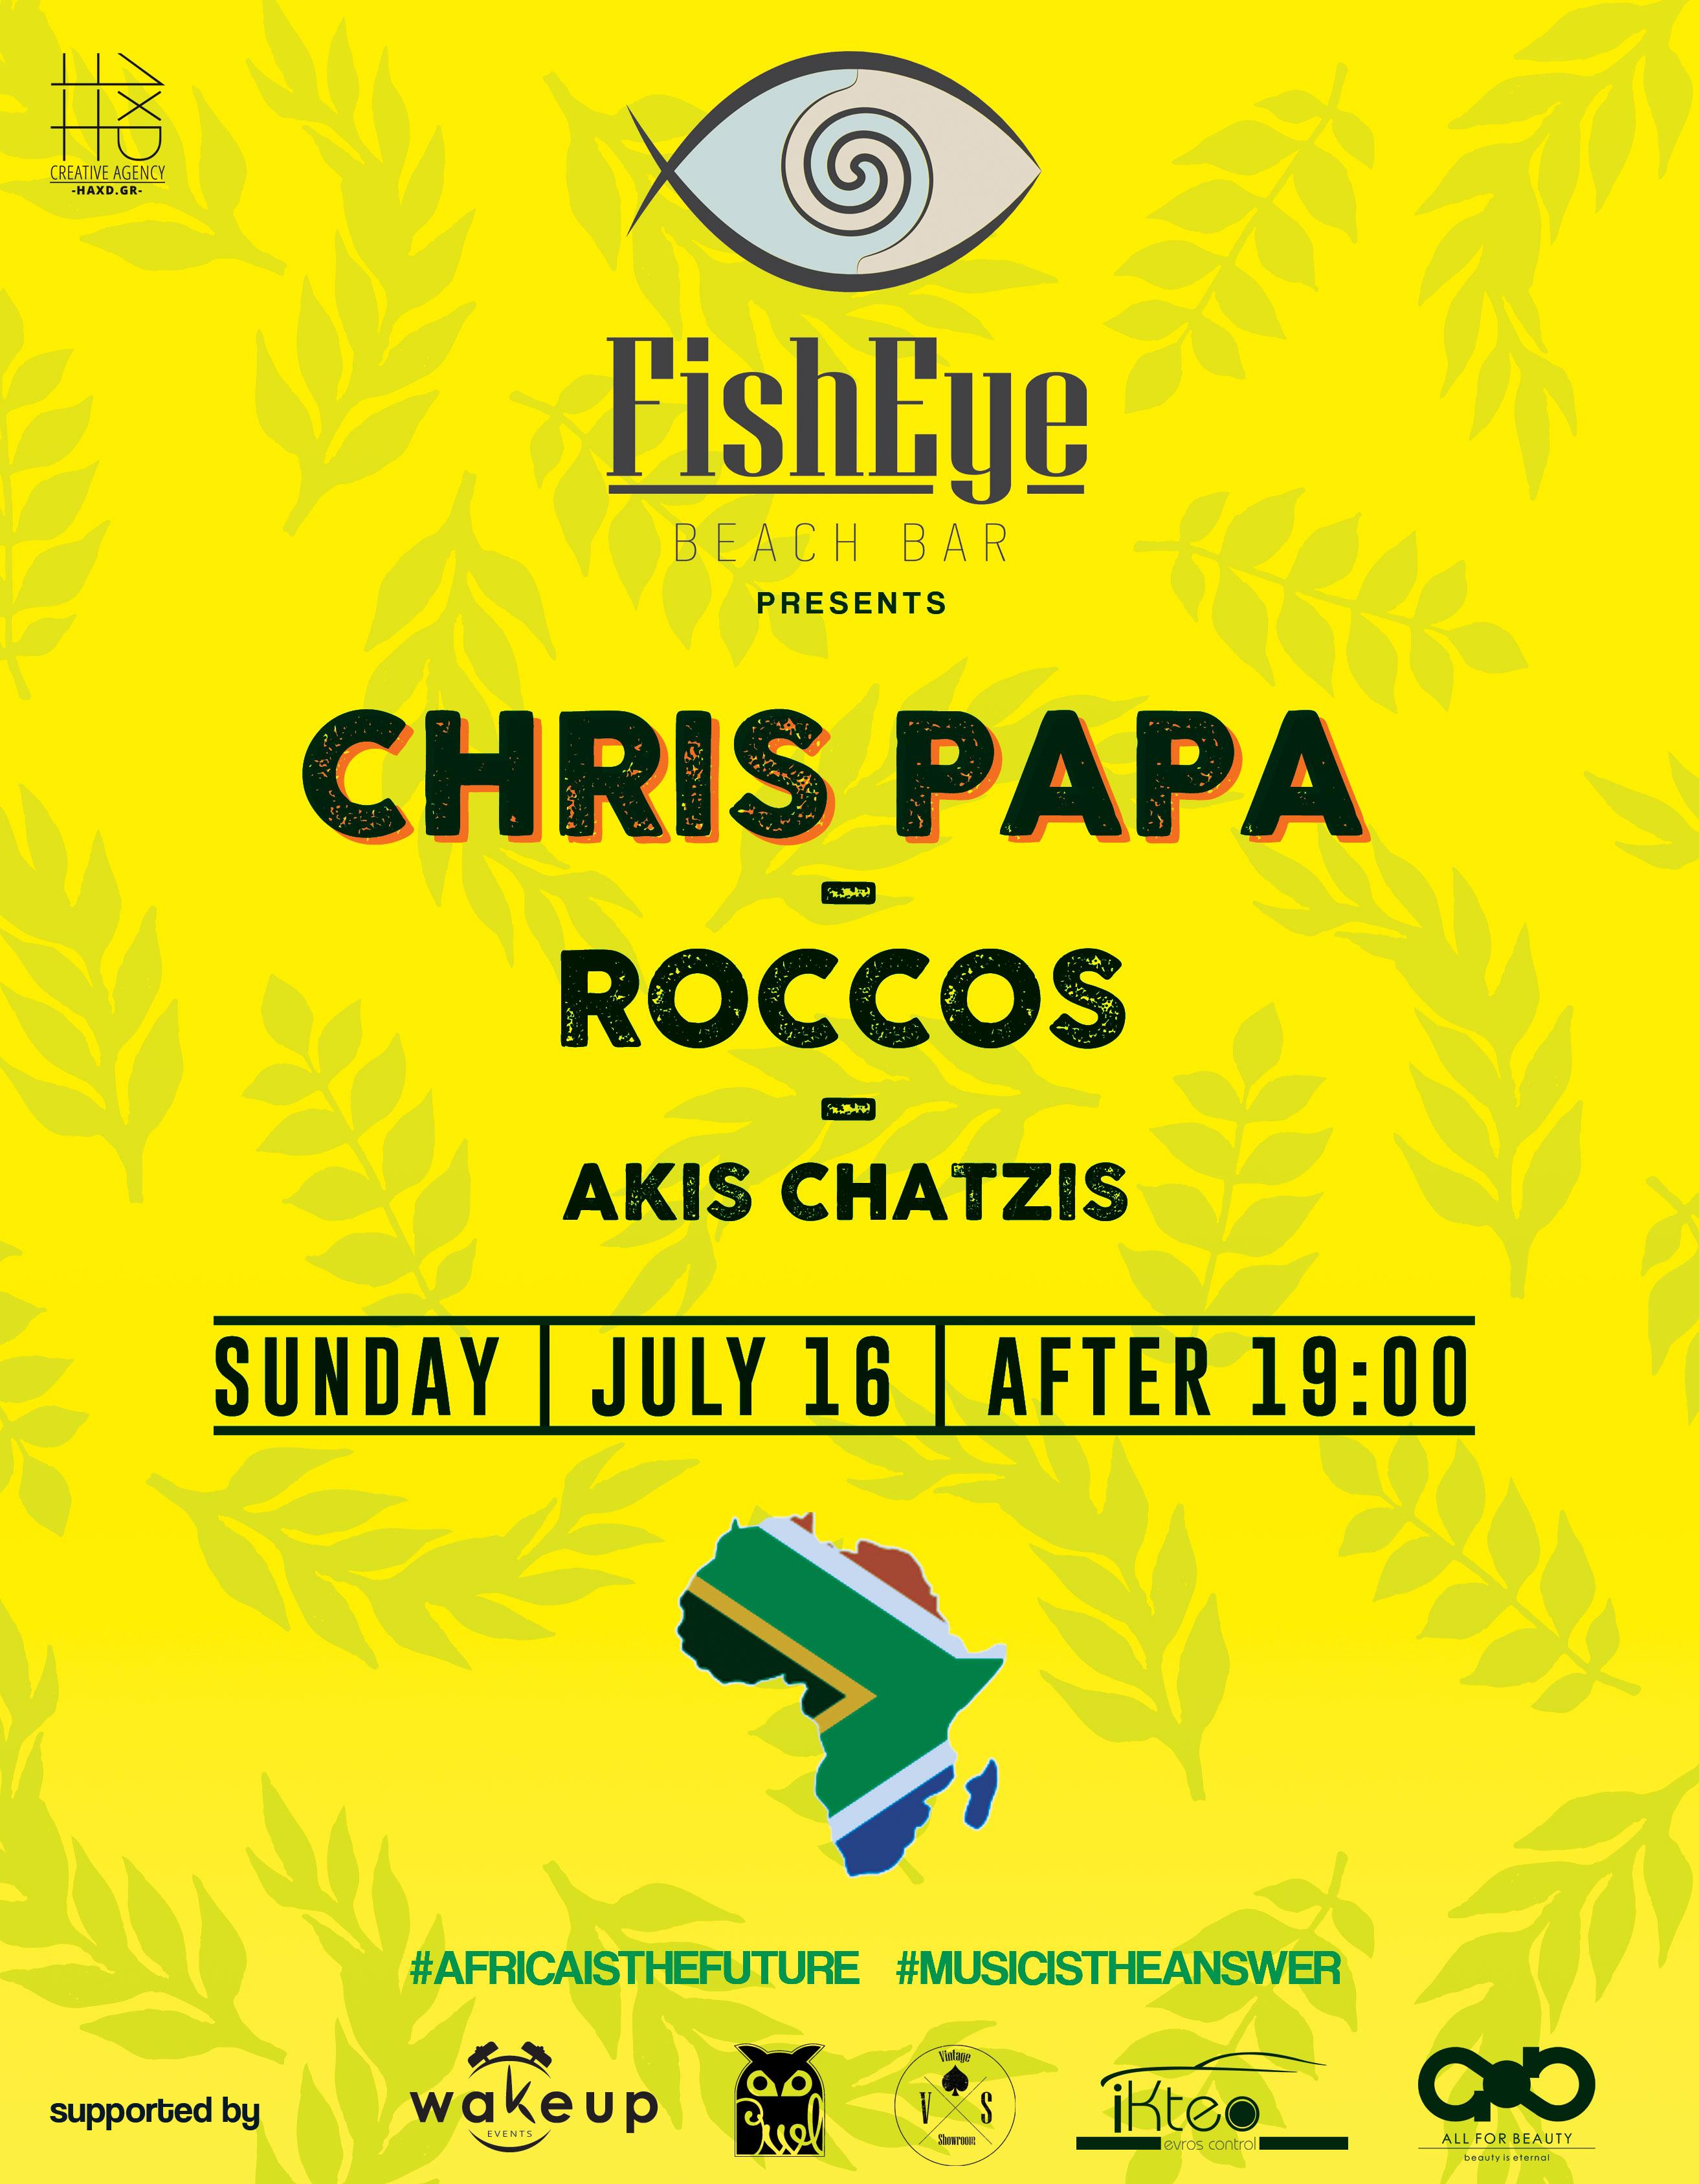 Chris Papa & Rocco along with Akis Chatzis @ Fisheye